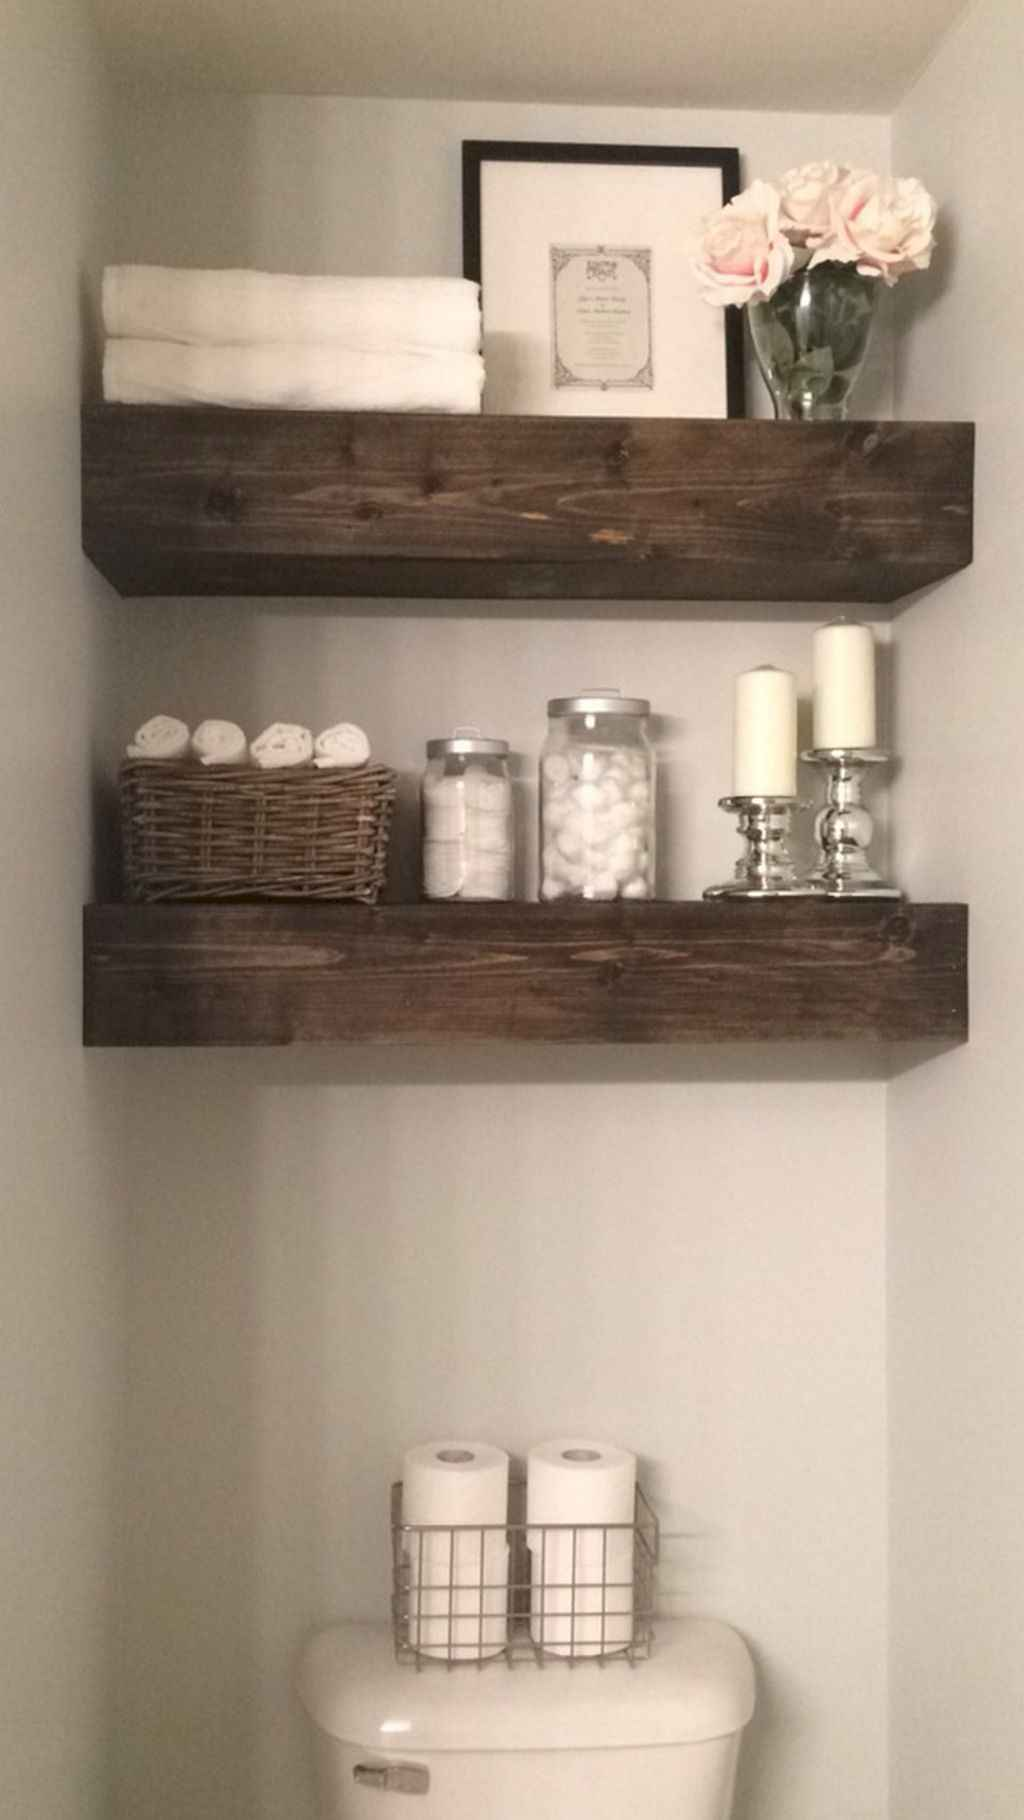 Cool bathroom storage shelves organization ideas (43)